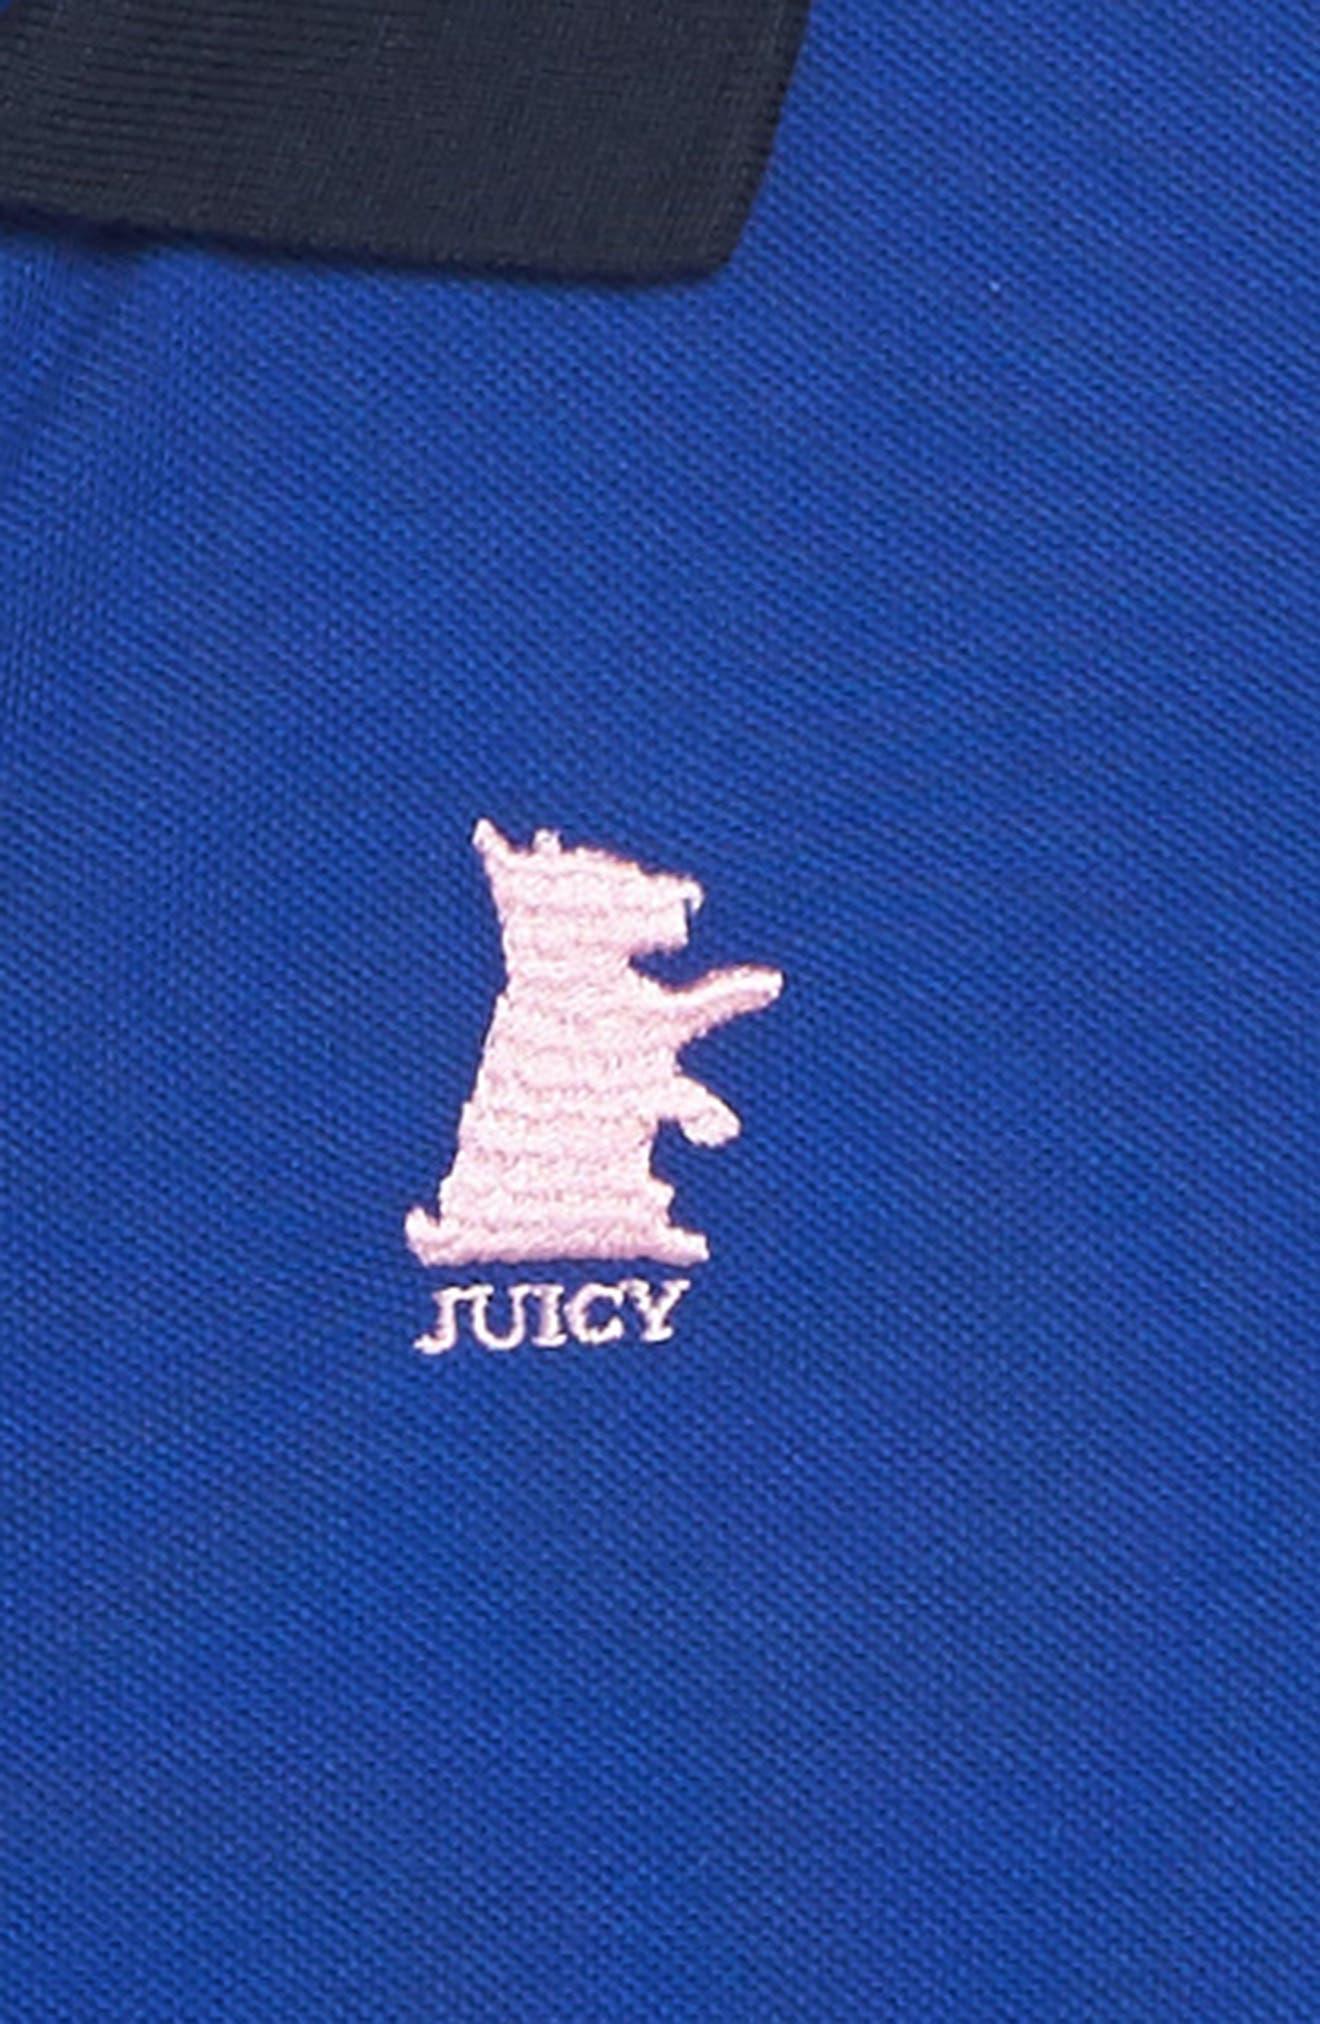 Piqué Polo Dress,                             Alternate thumbnail 3, color,                             Blue Night